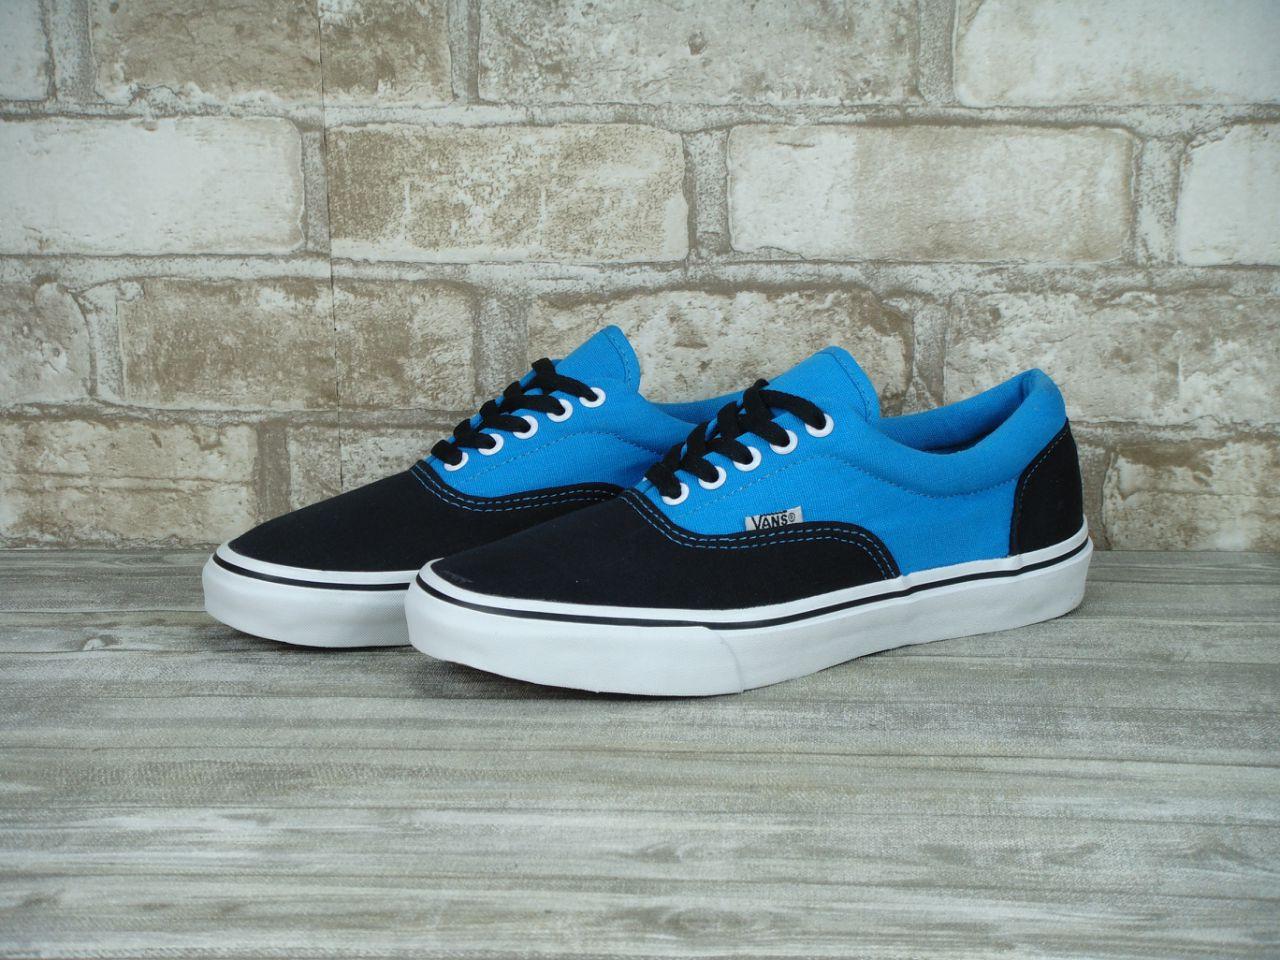 Кеды Vans Authentic Black Blue White Sole - Интернет-магазин «Reverie Shoes 65c3949338d